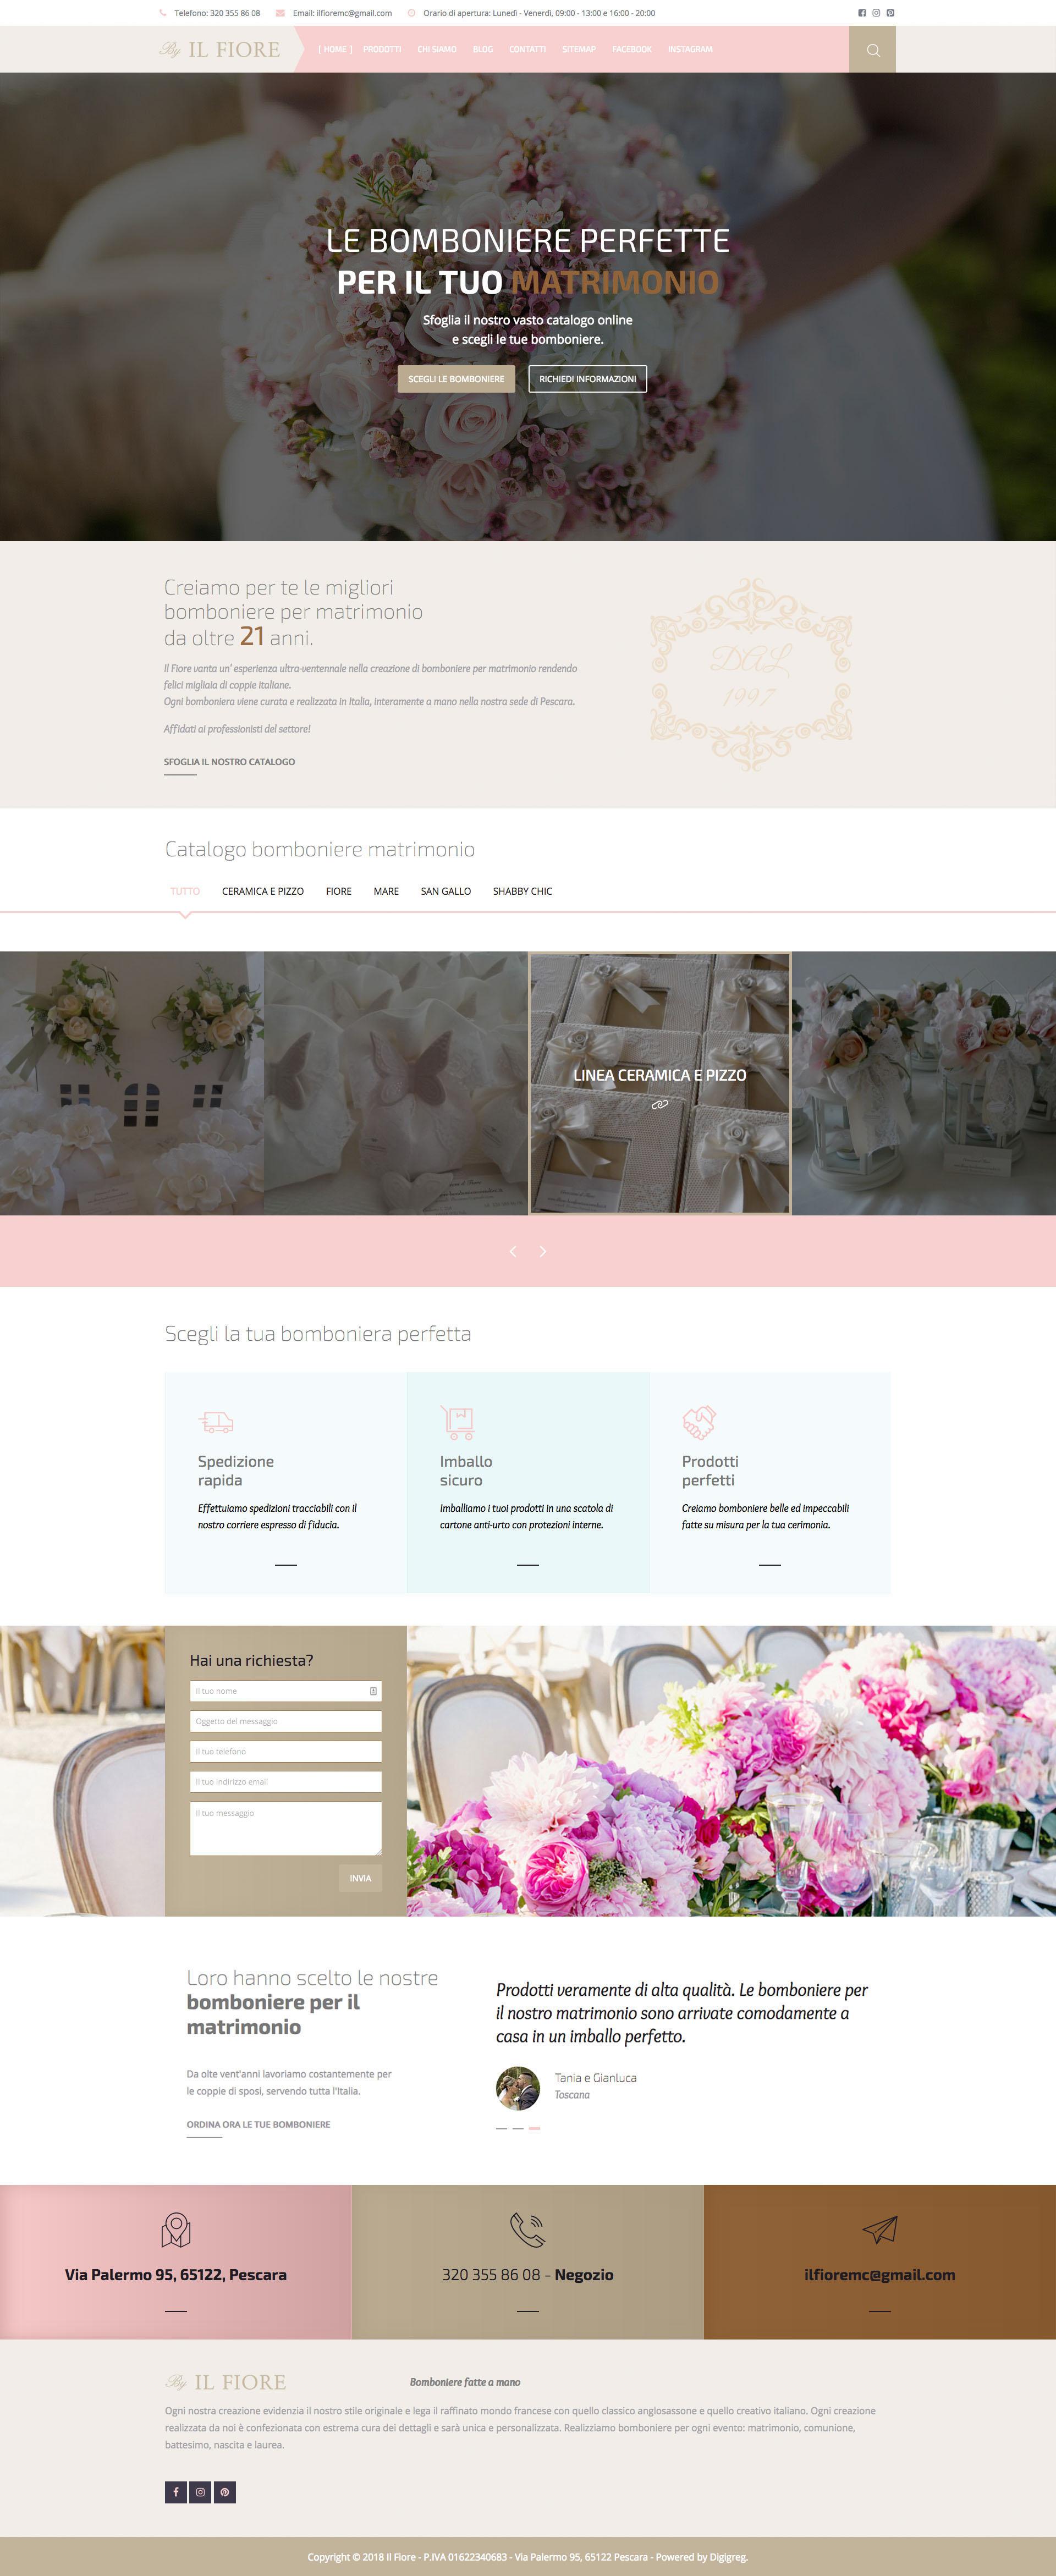 Il Fiore Wedding Favors Digigreg